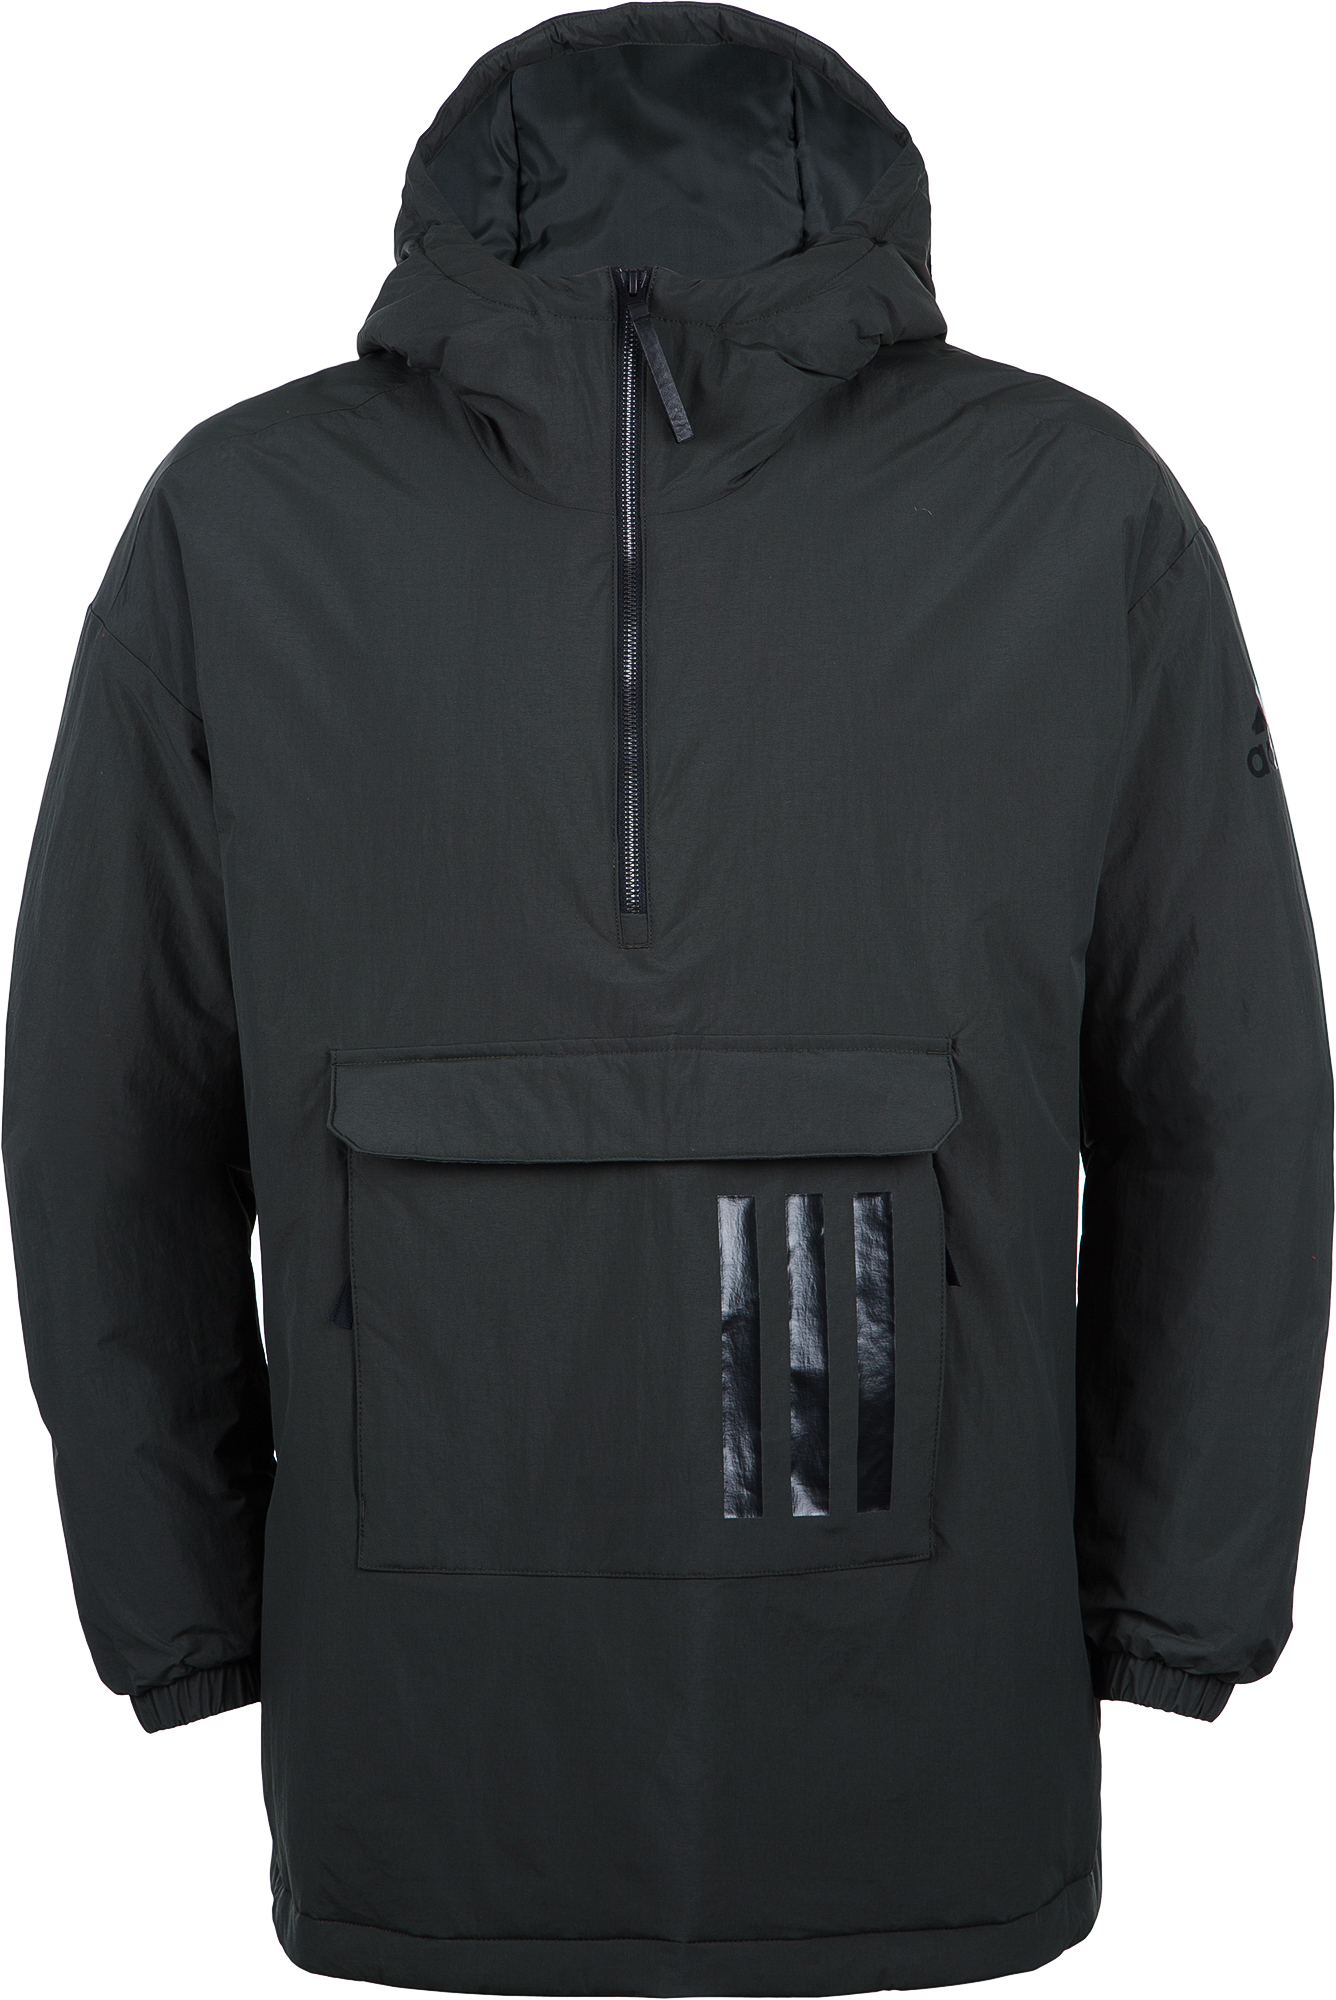 Adidas Куртка утепленная мужская Adidas, размер 48